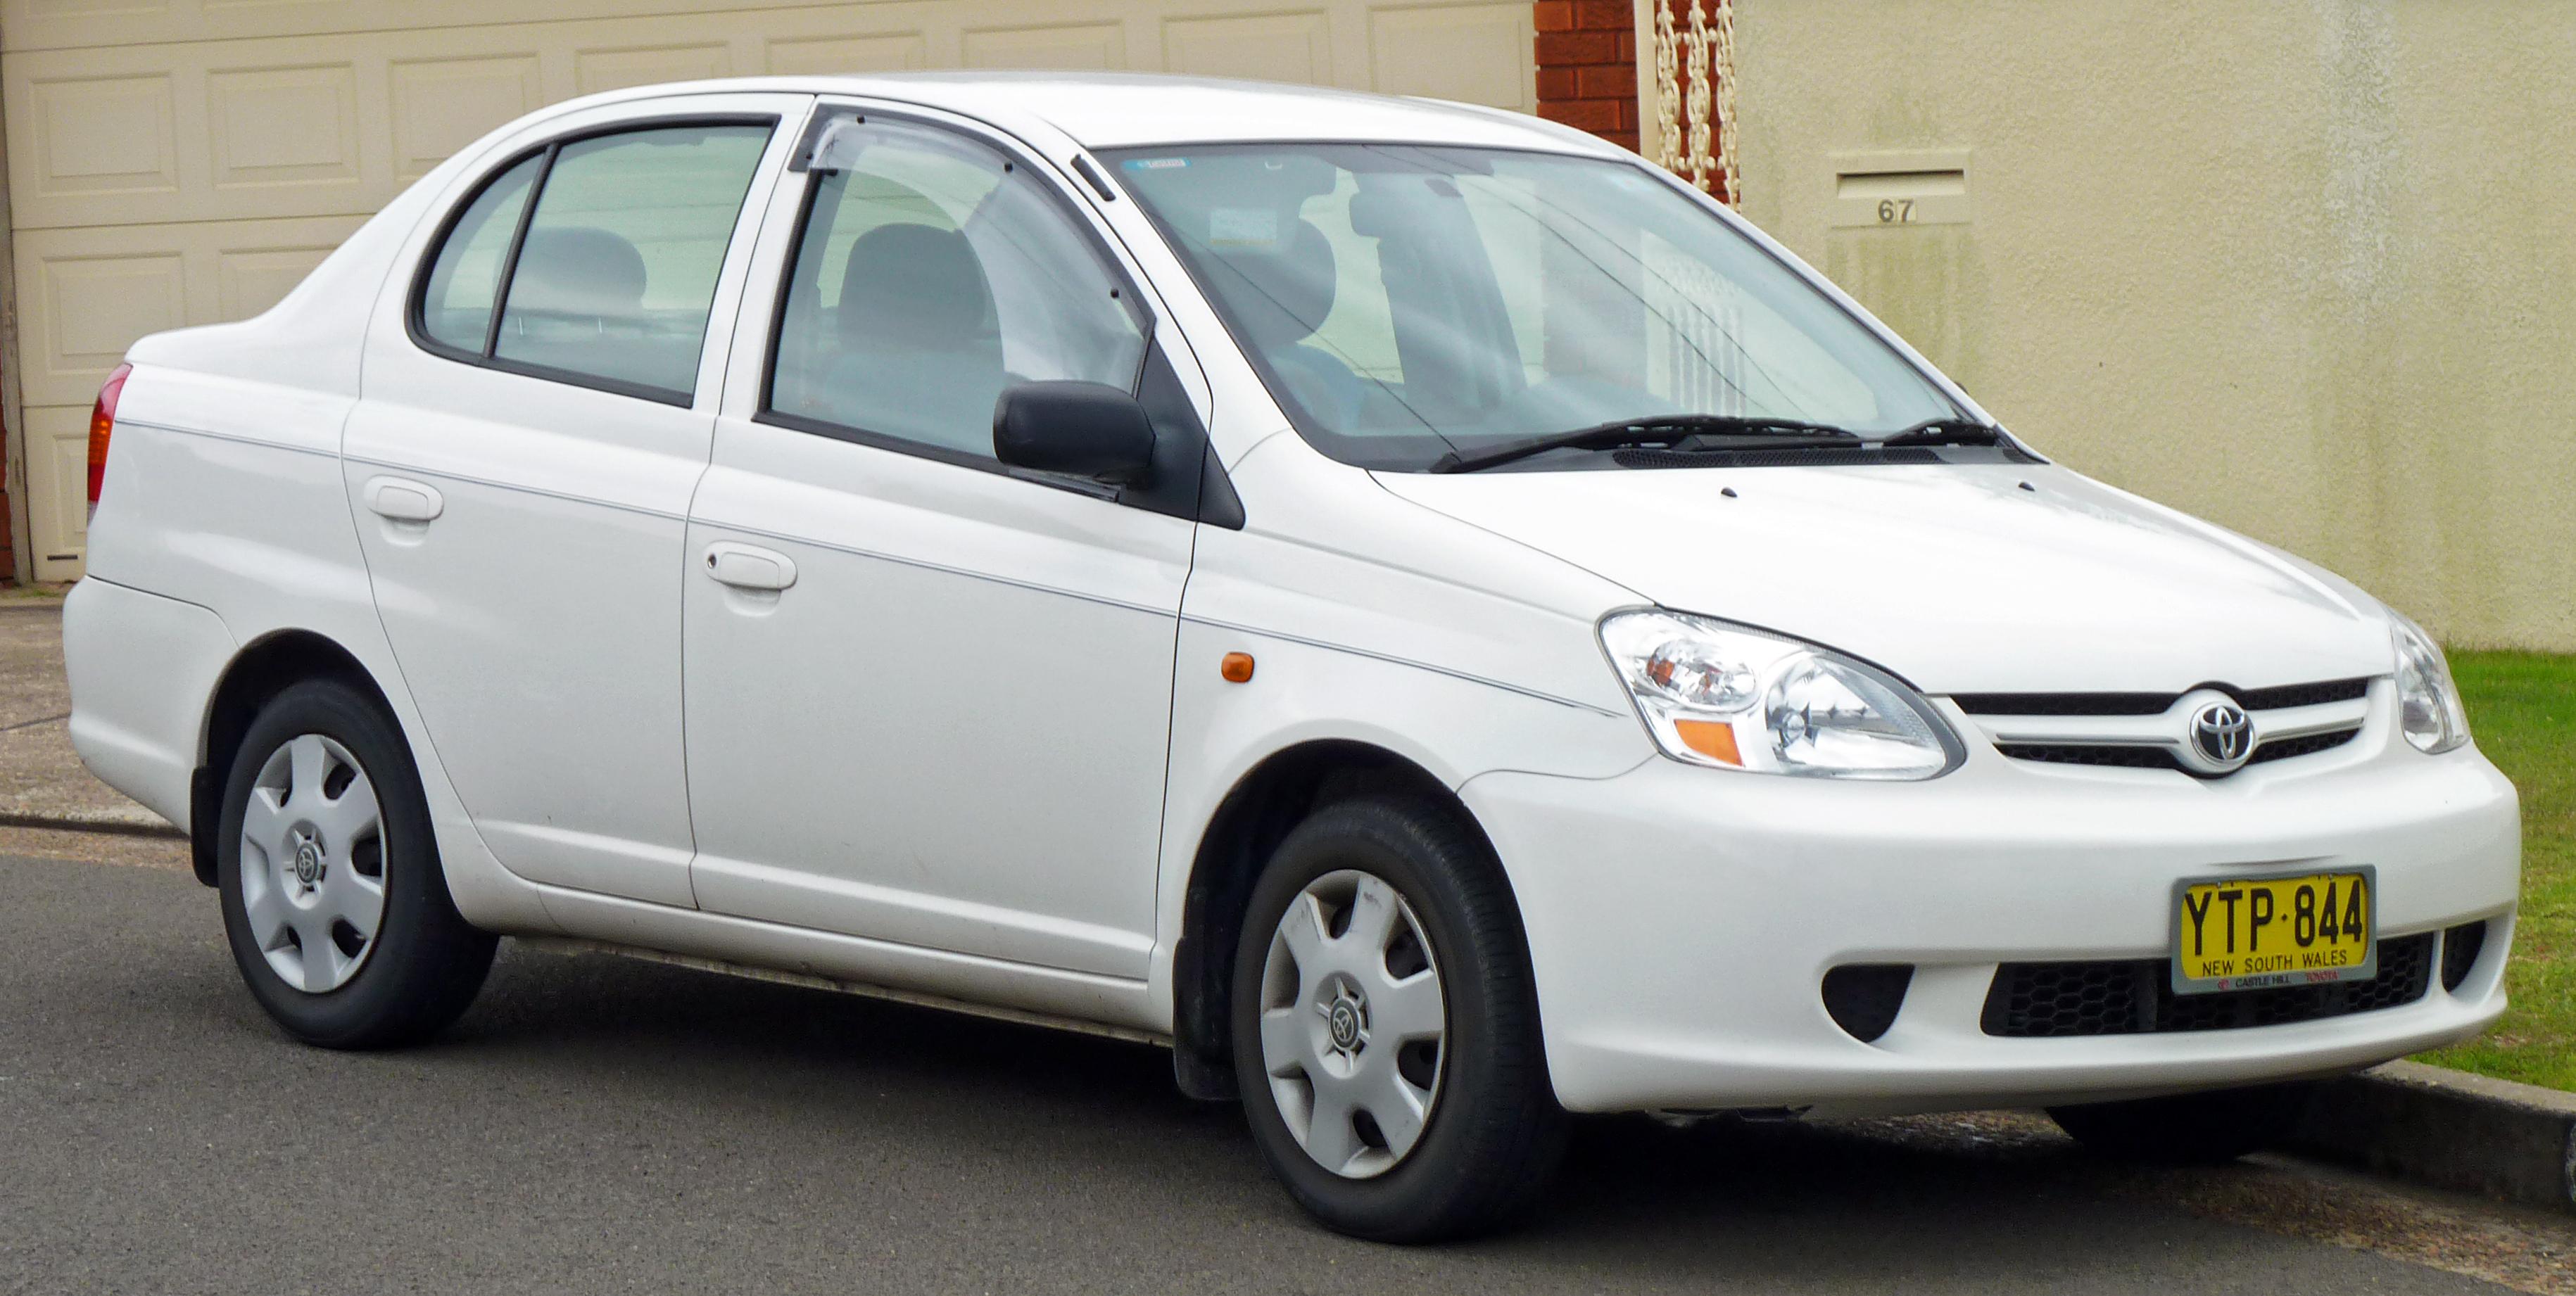 Toyota Corolla 2010 Type S >> File:2002-2005 Toyota Echo (NCP12R) sedan 01.jpg - Wikimedia Commons